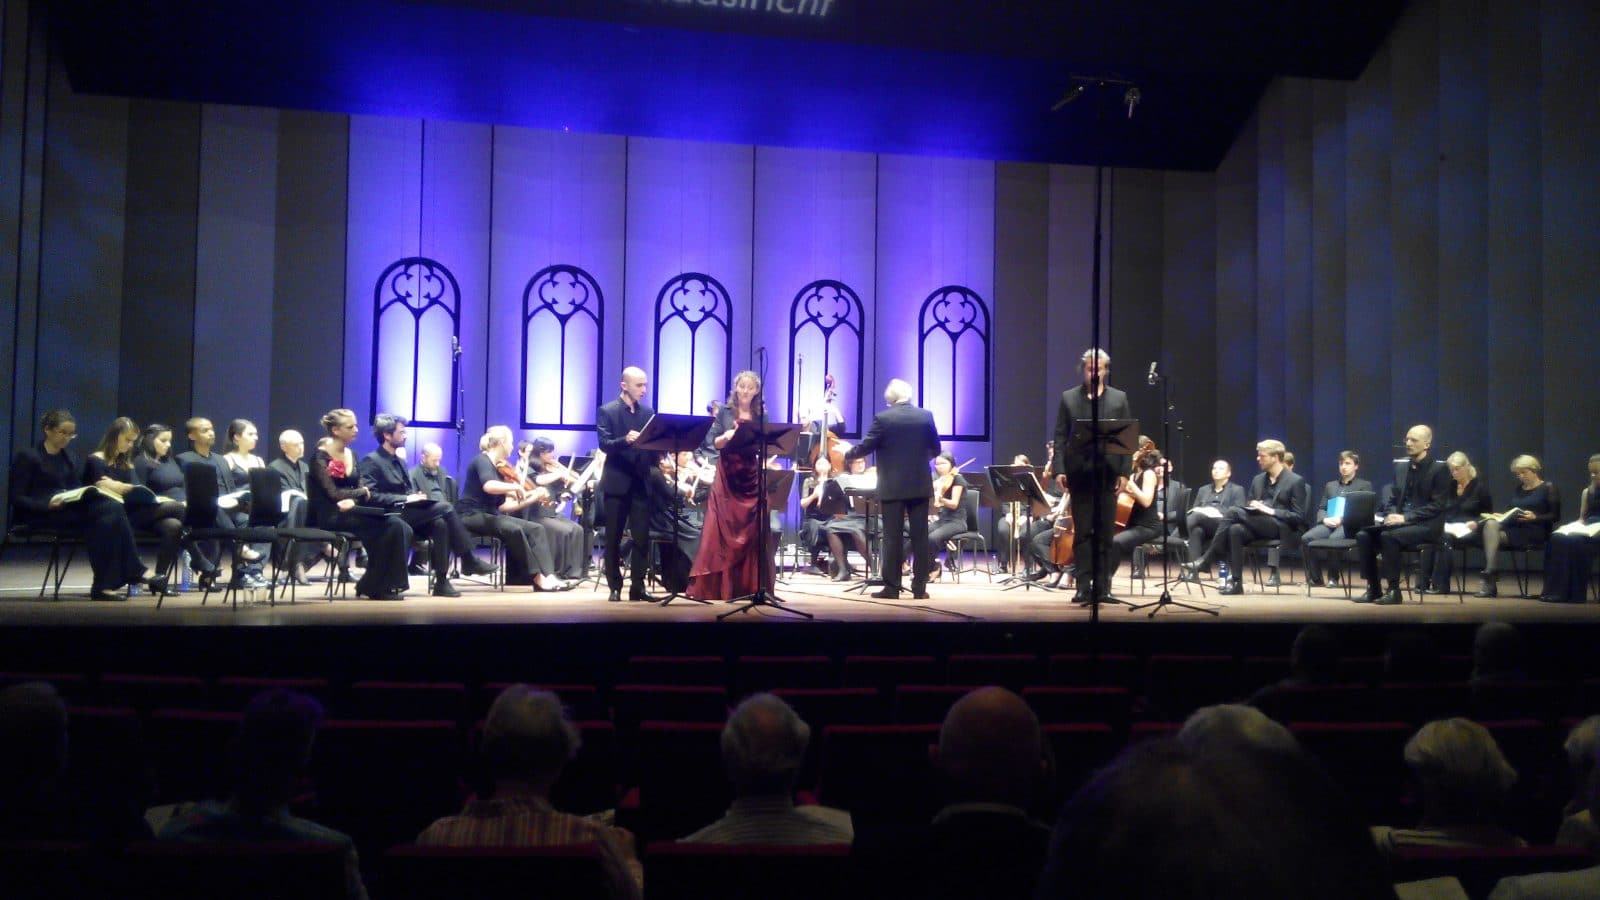 Ensemble Currende, studenten en almumni Koninklijk Conservatorium in Alceste 17-9-2016